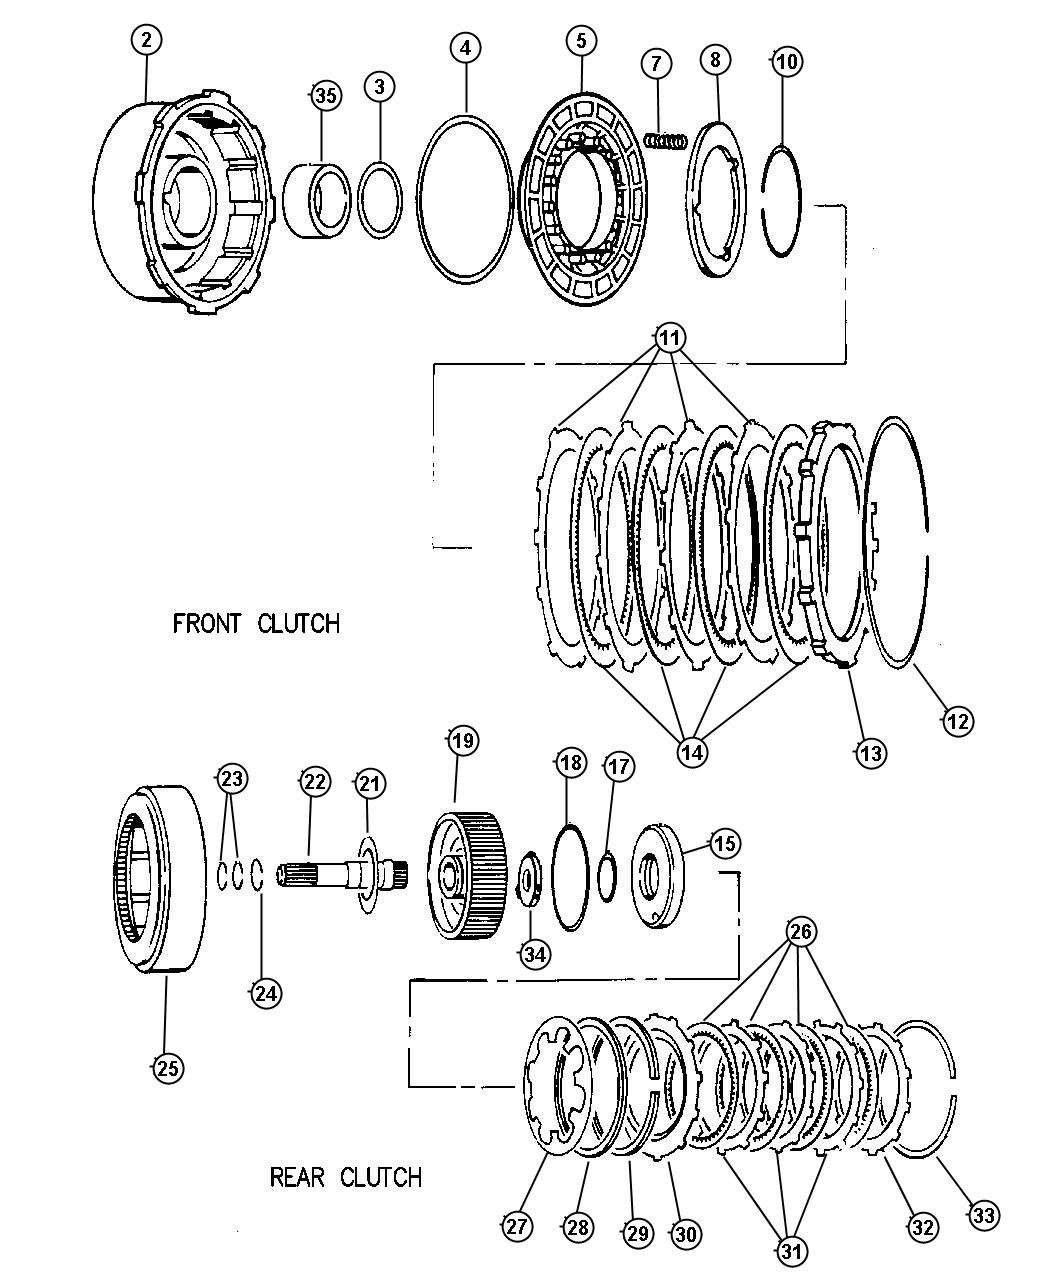 hight resolution of 1994 dodge ram 47rh transmission parts diagram dodge 47rh transmission wiring diagram 47rh transmission parts diagram